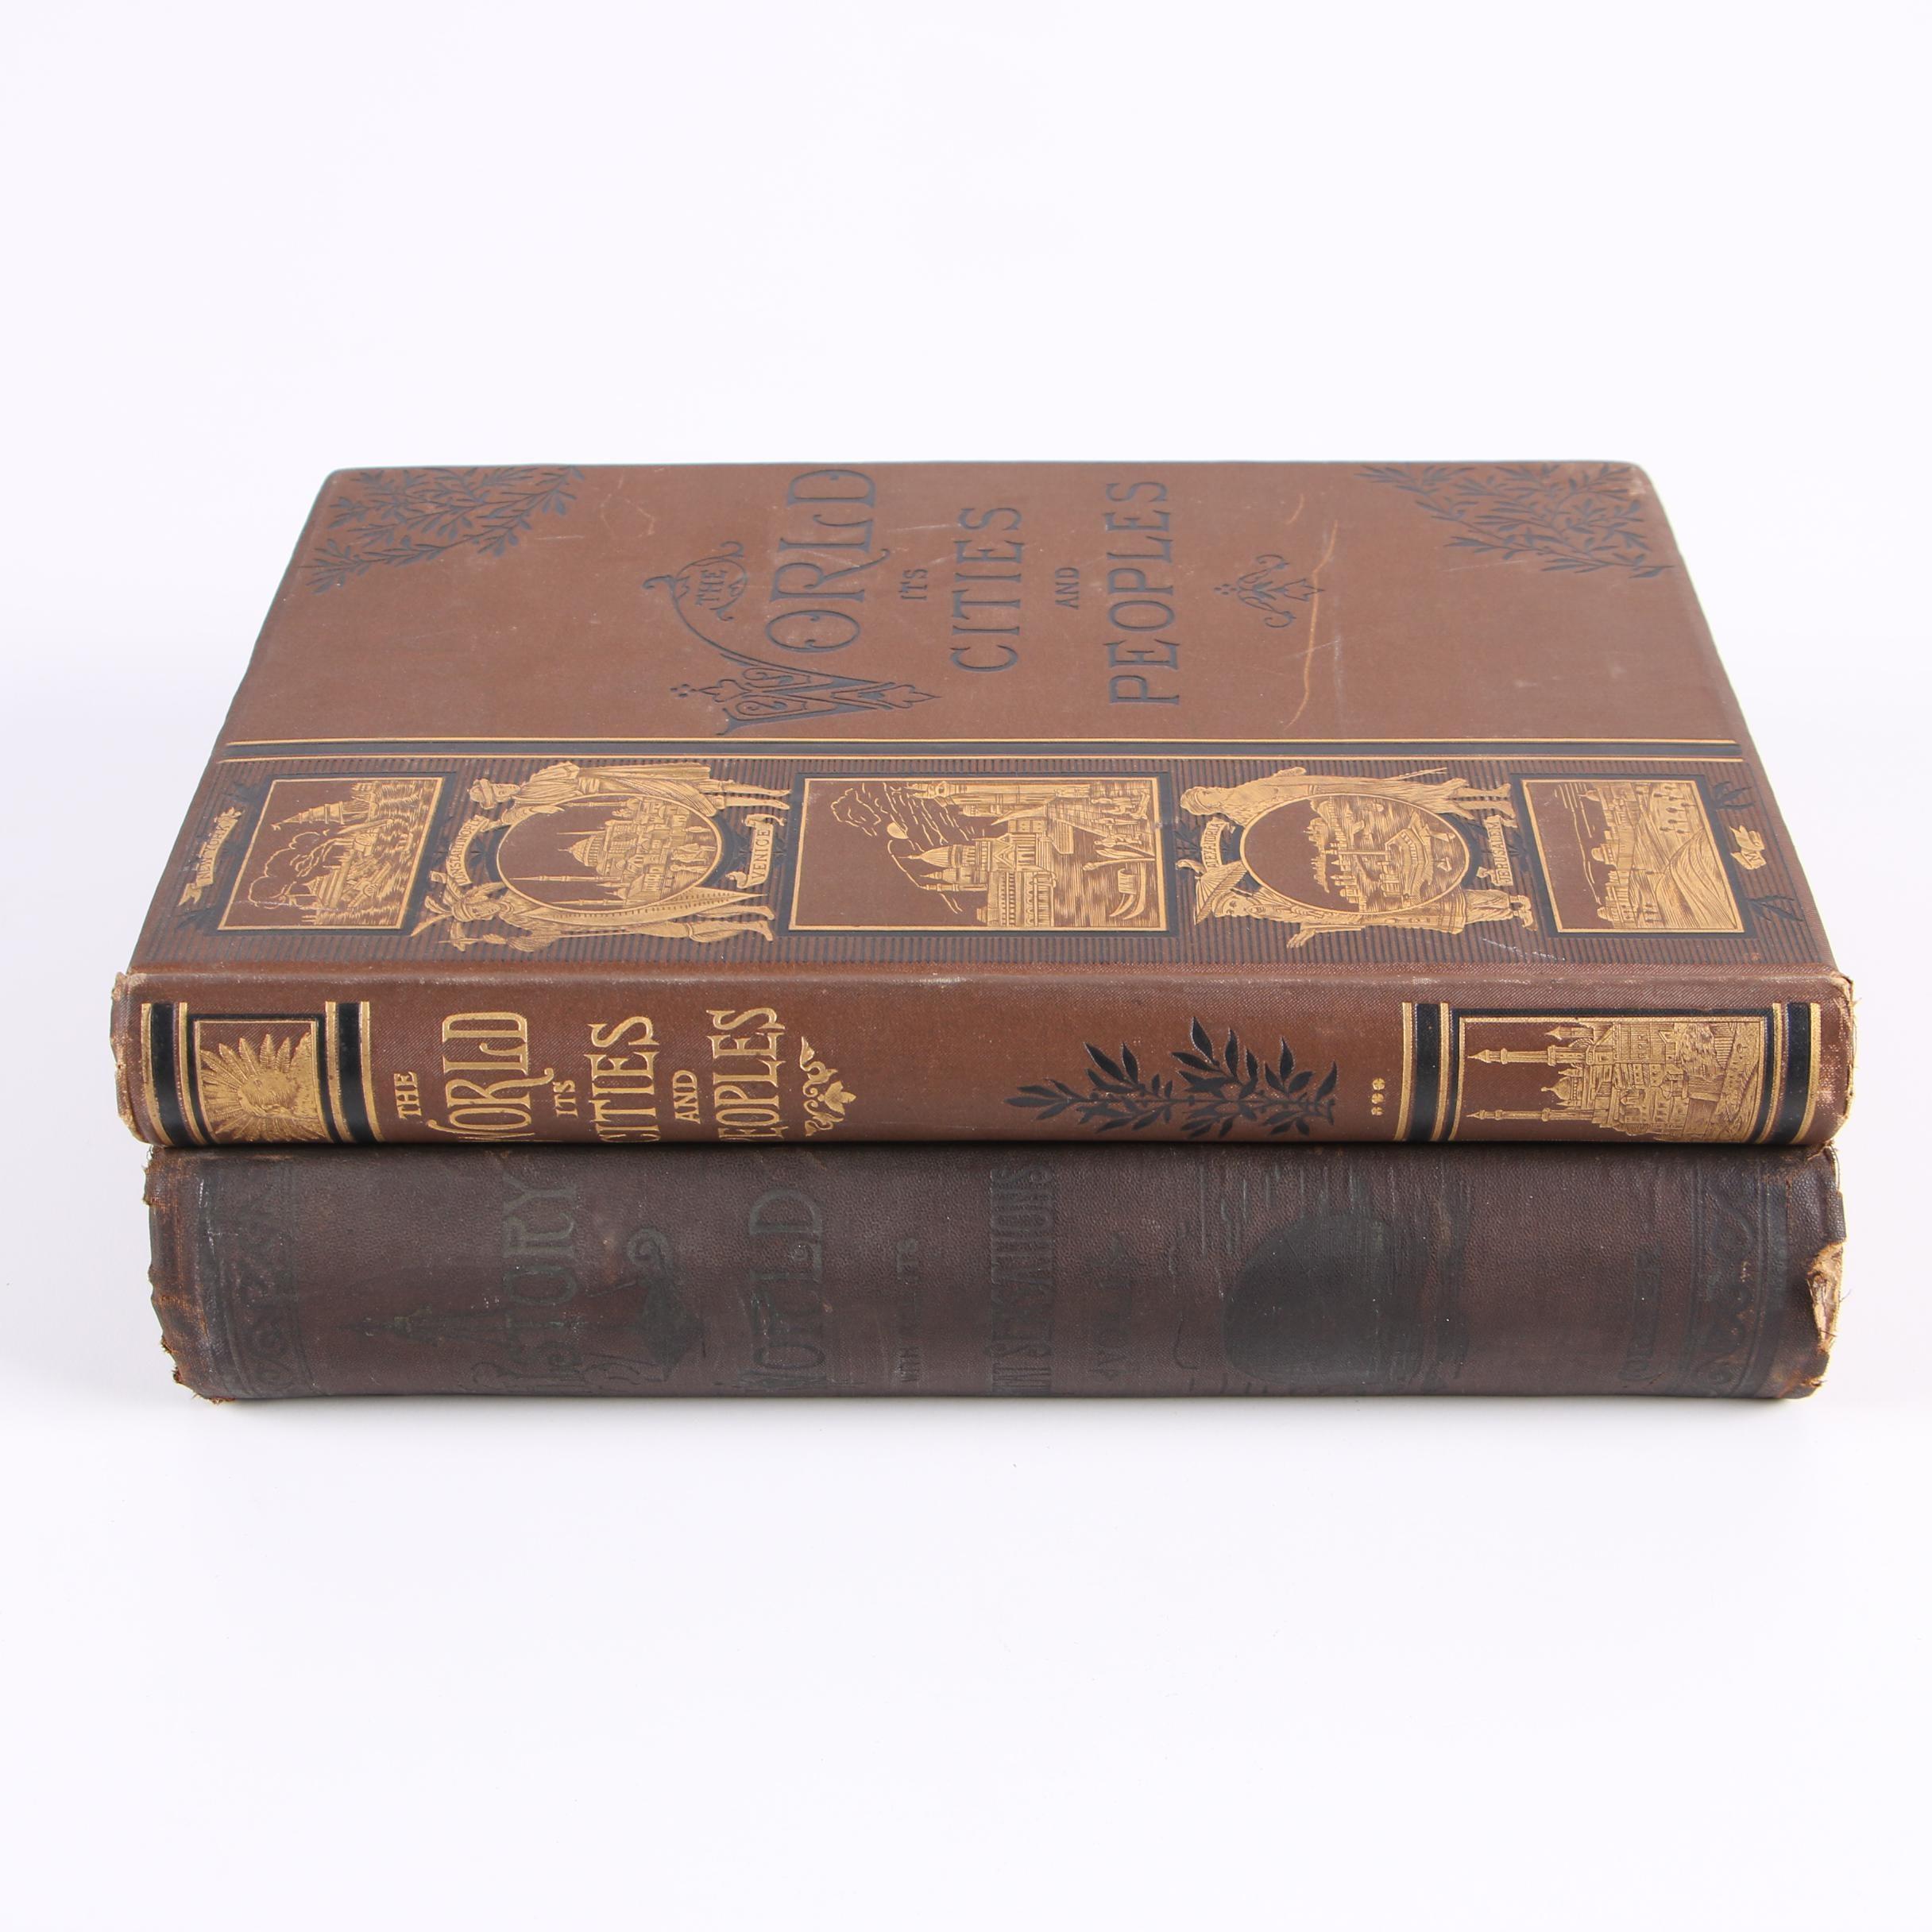 Late 19th Century Books on World History